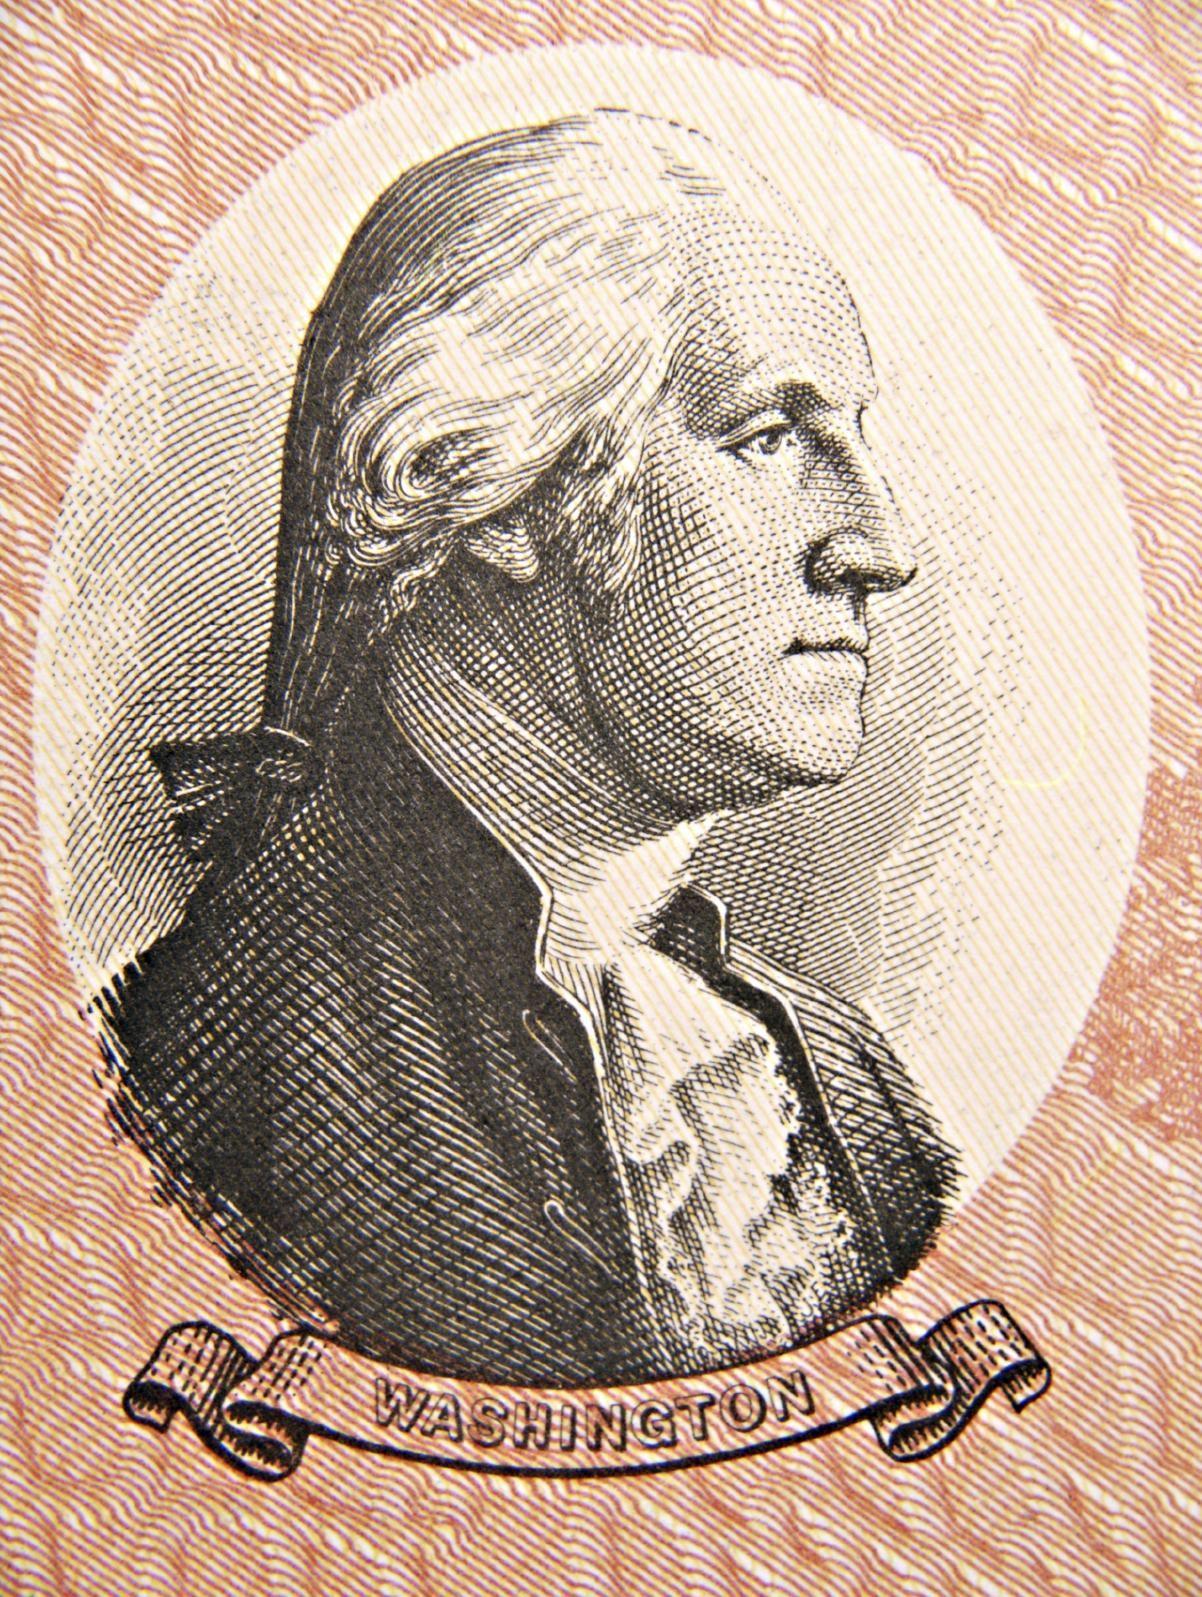 A Lesson Plan On George Washington Created By David Adler